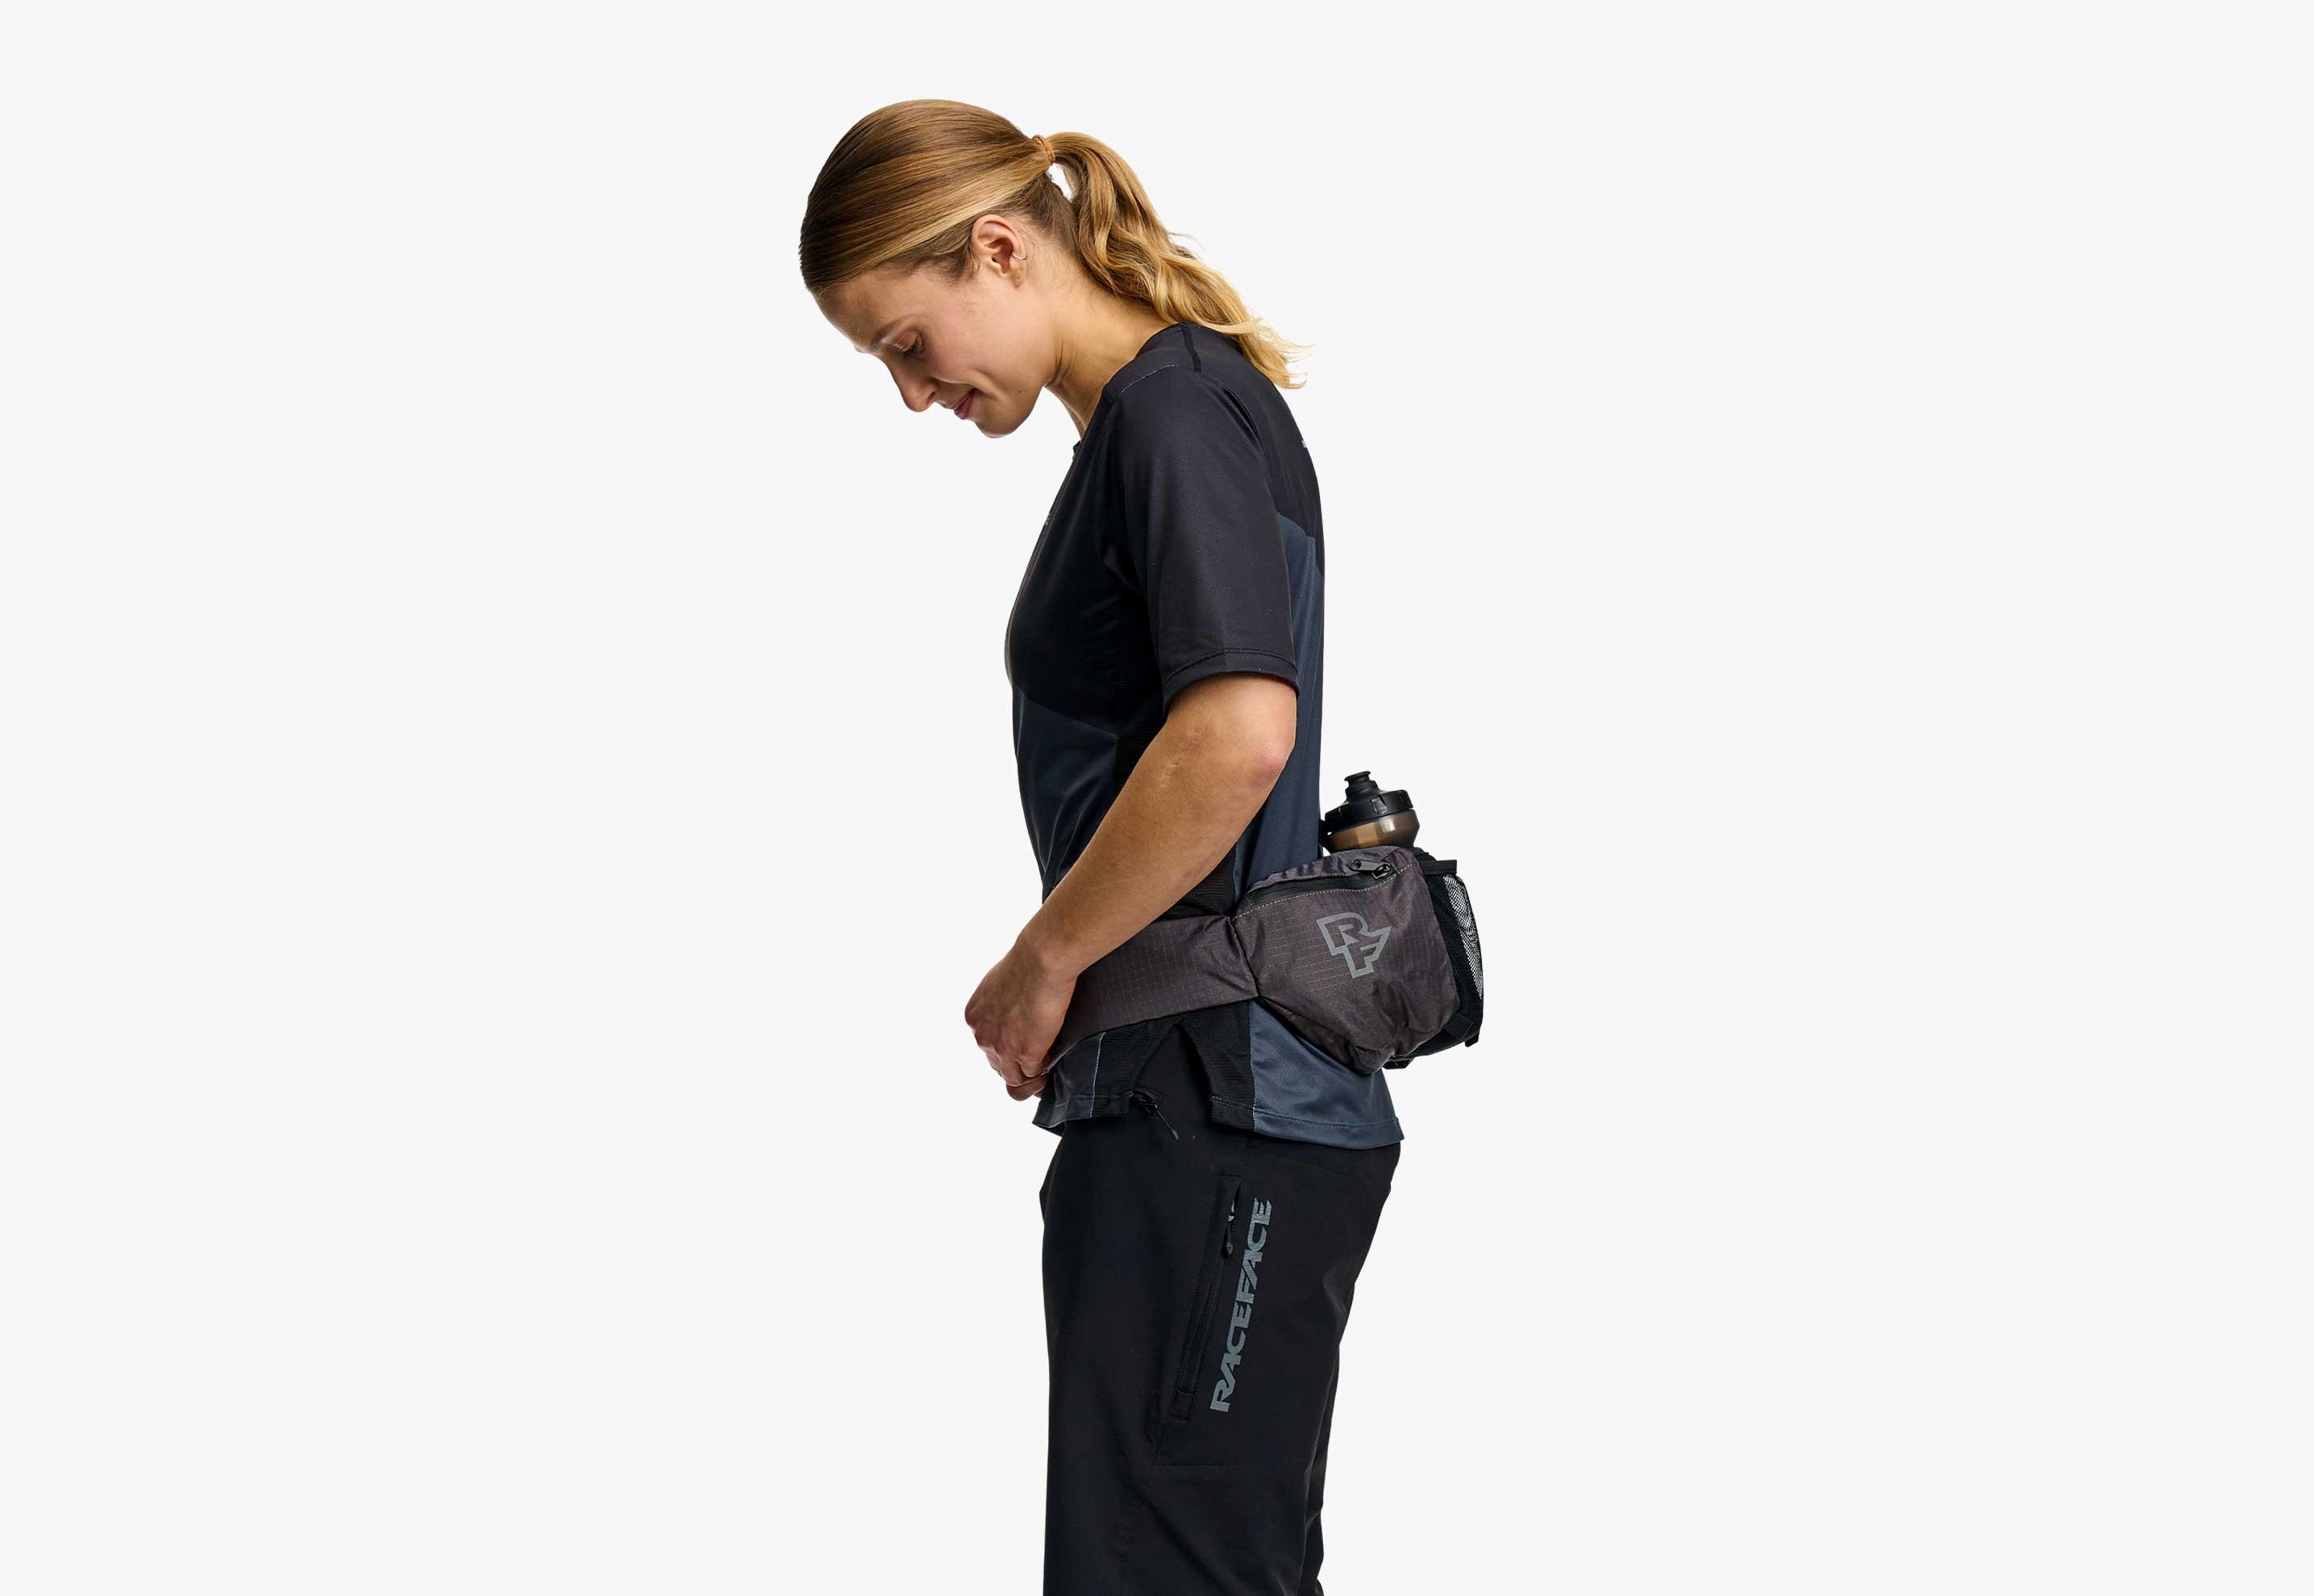 Stash Quick Rip 1.5L Bag